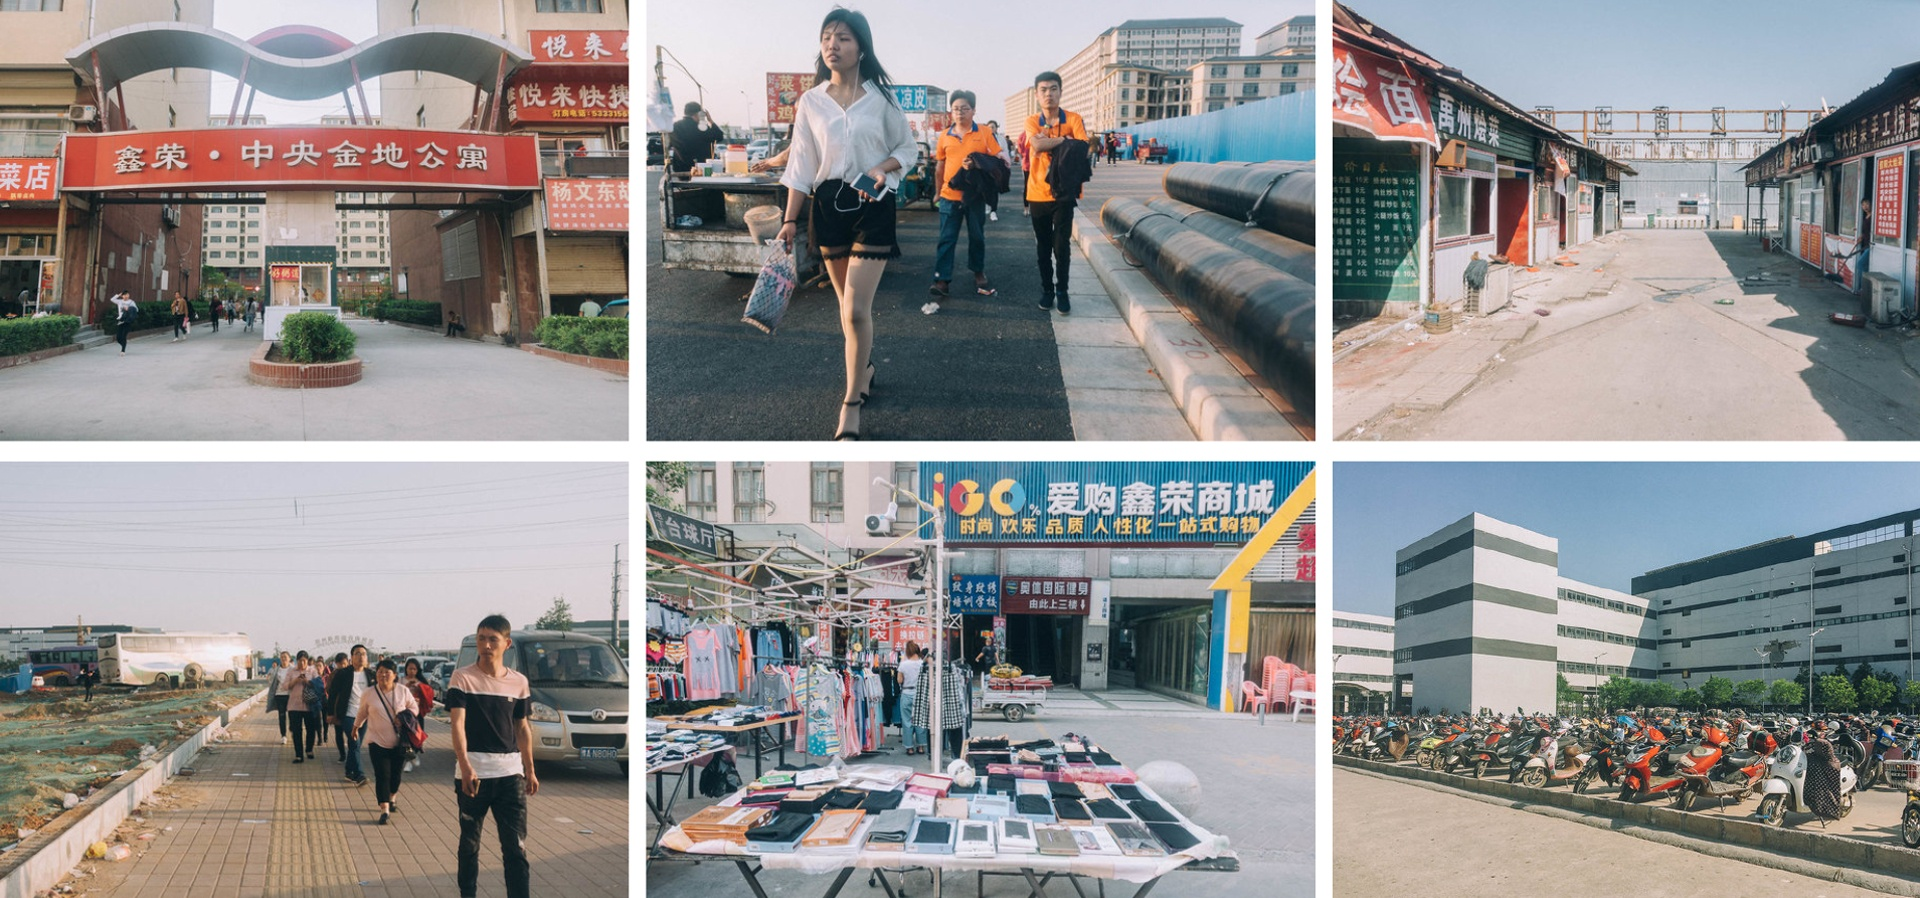 'Thanh pho iPhone' dang dan bien mat o Trung Quoc hinh anh 19